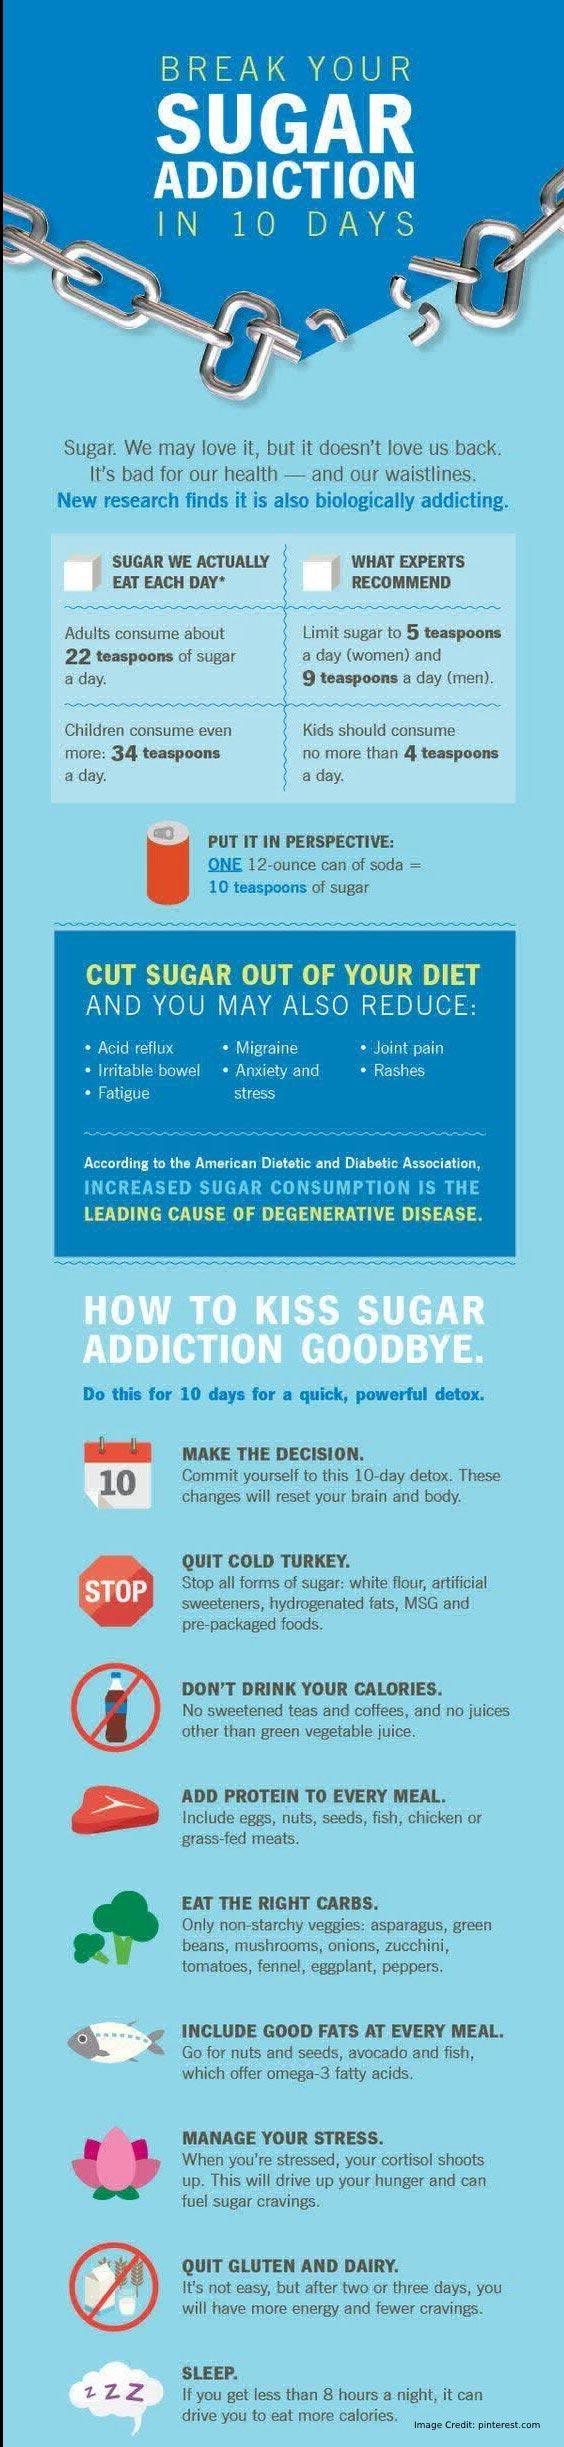 Sugar Addiction Info